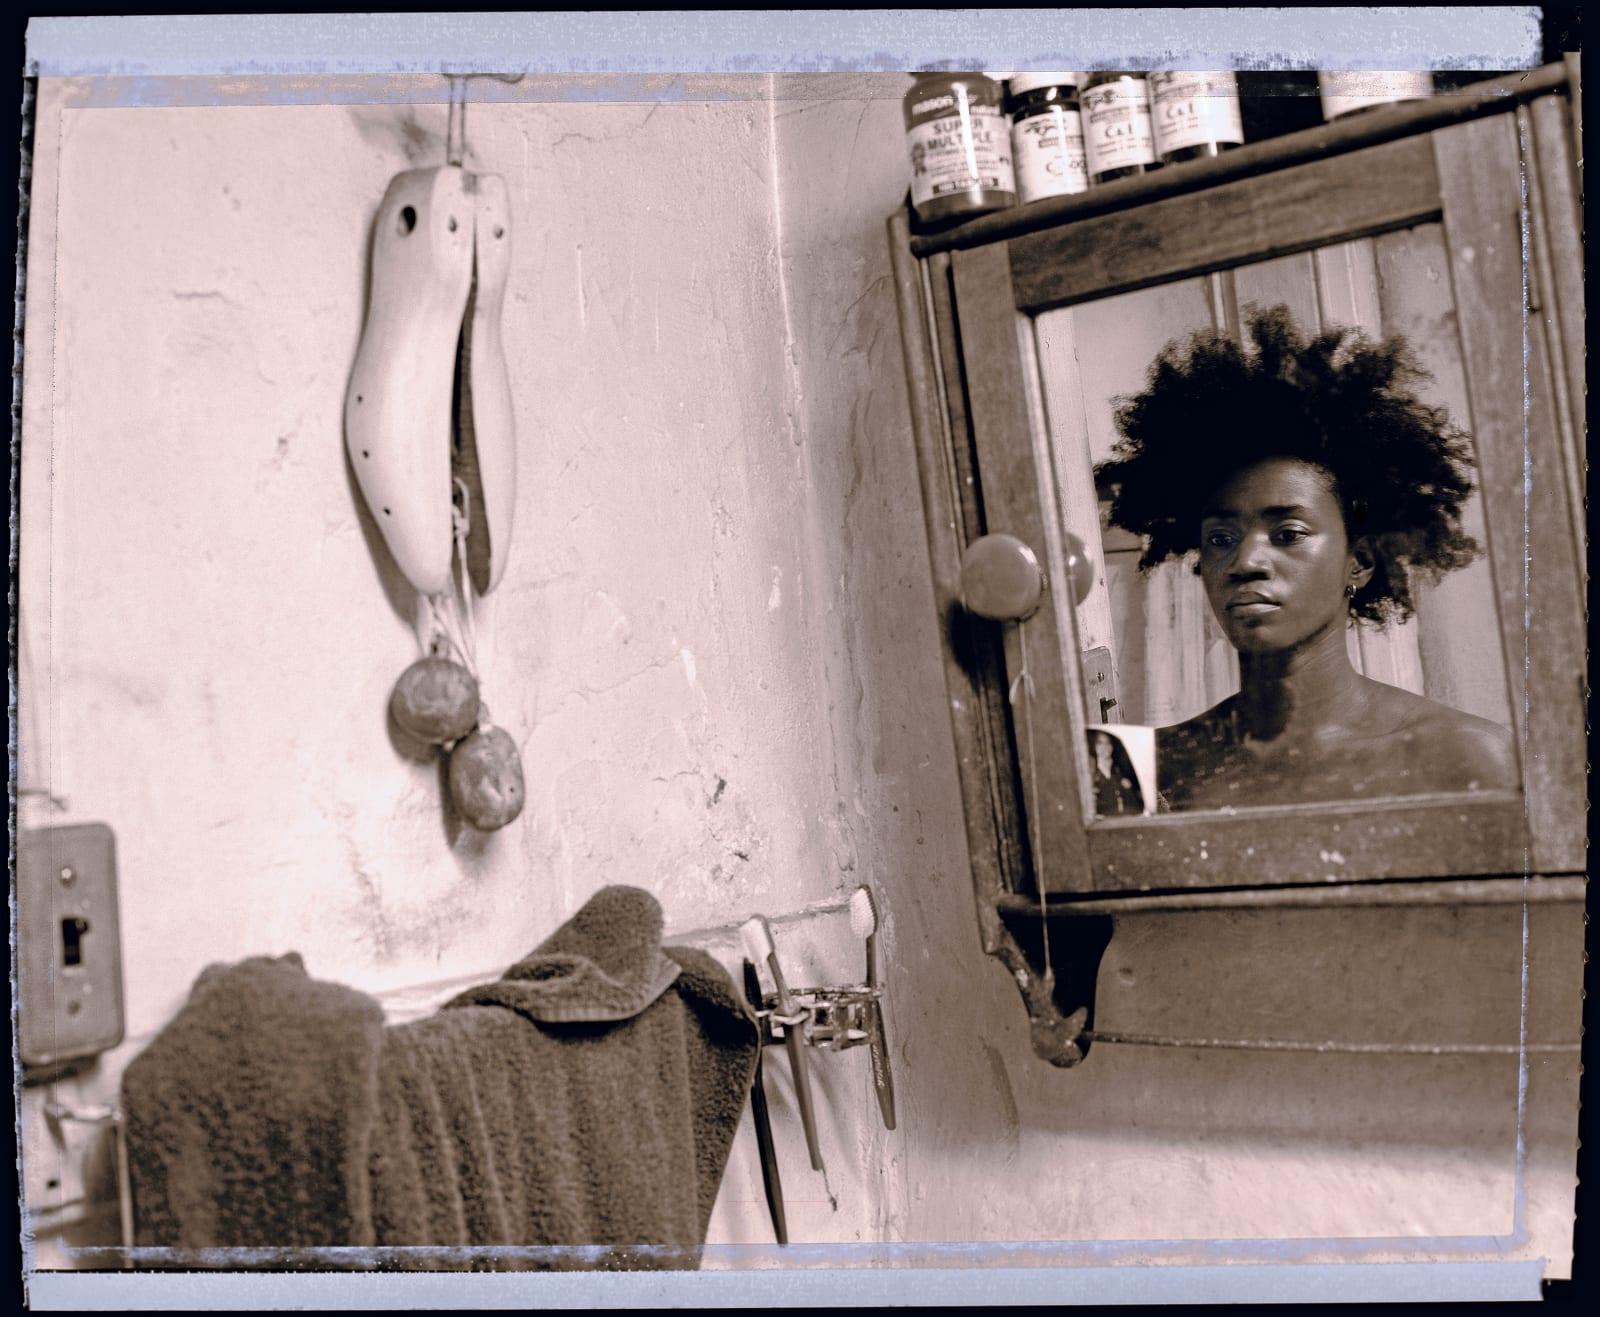 John Pinderhughes Pretty for a Black Girl, 1998 24.85 x 28 inches